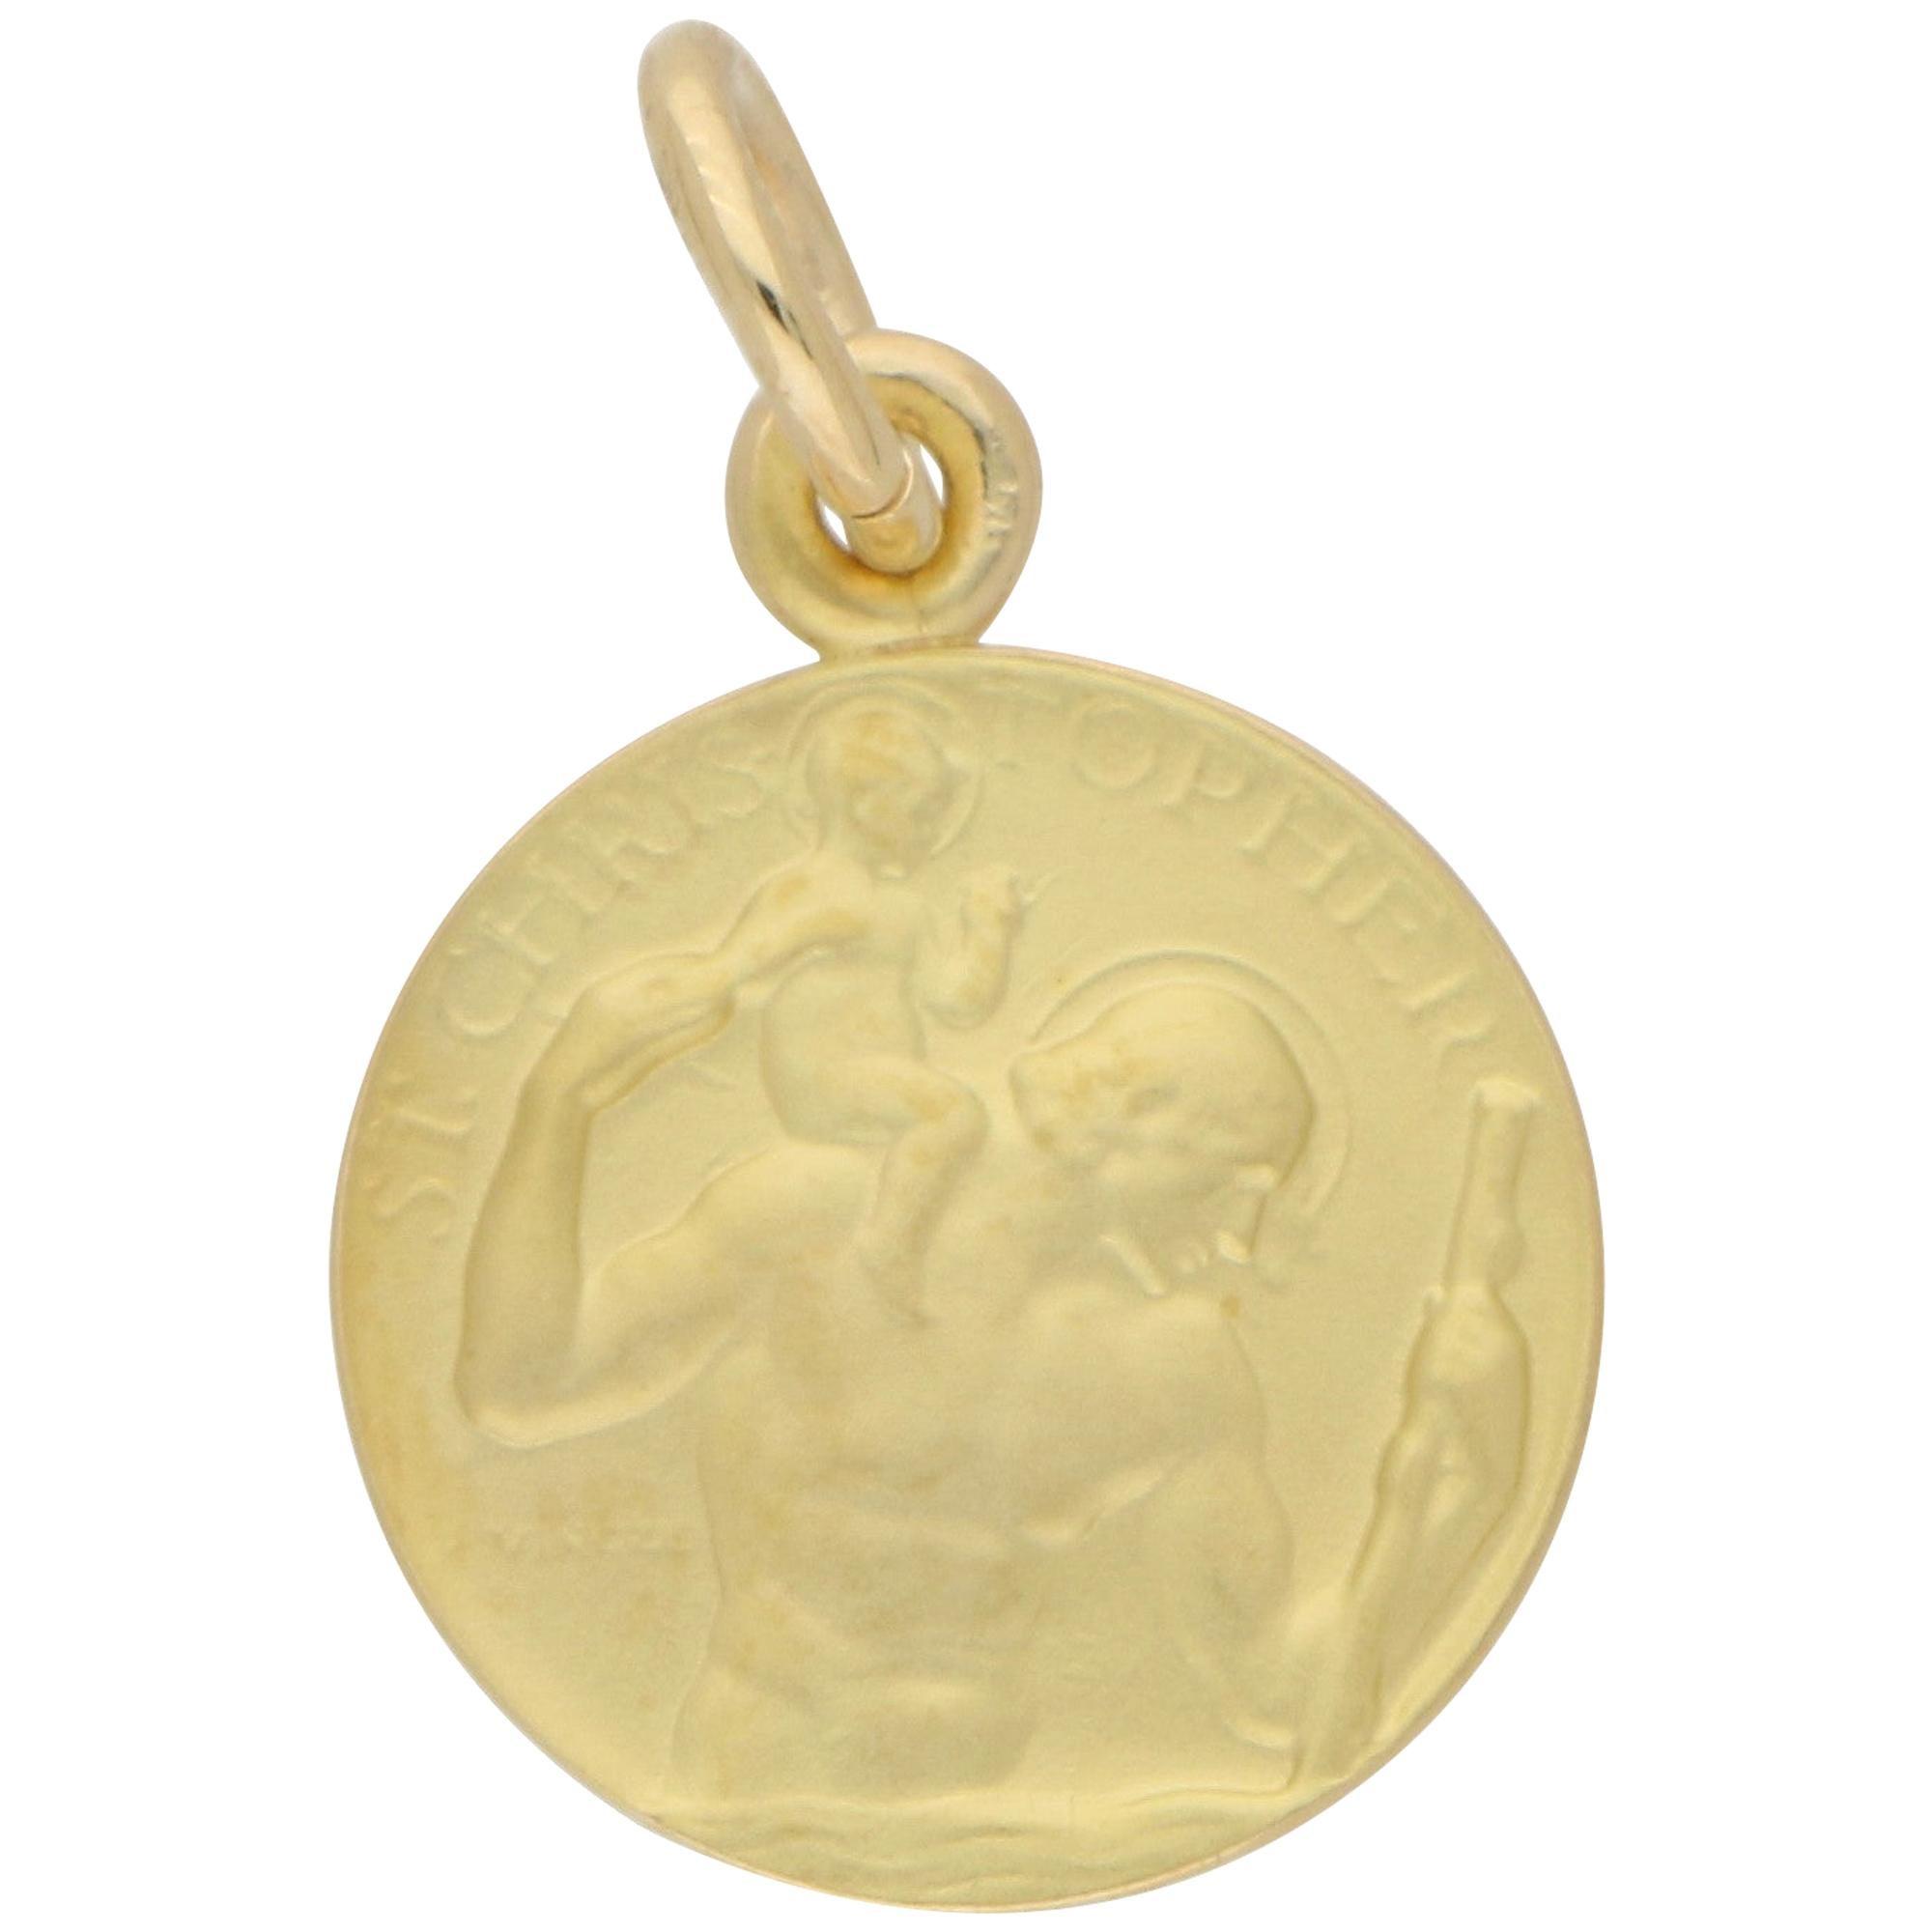 St. Christopher Pendant / Charm in 9 Karat Yellow Gold